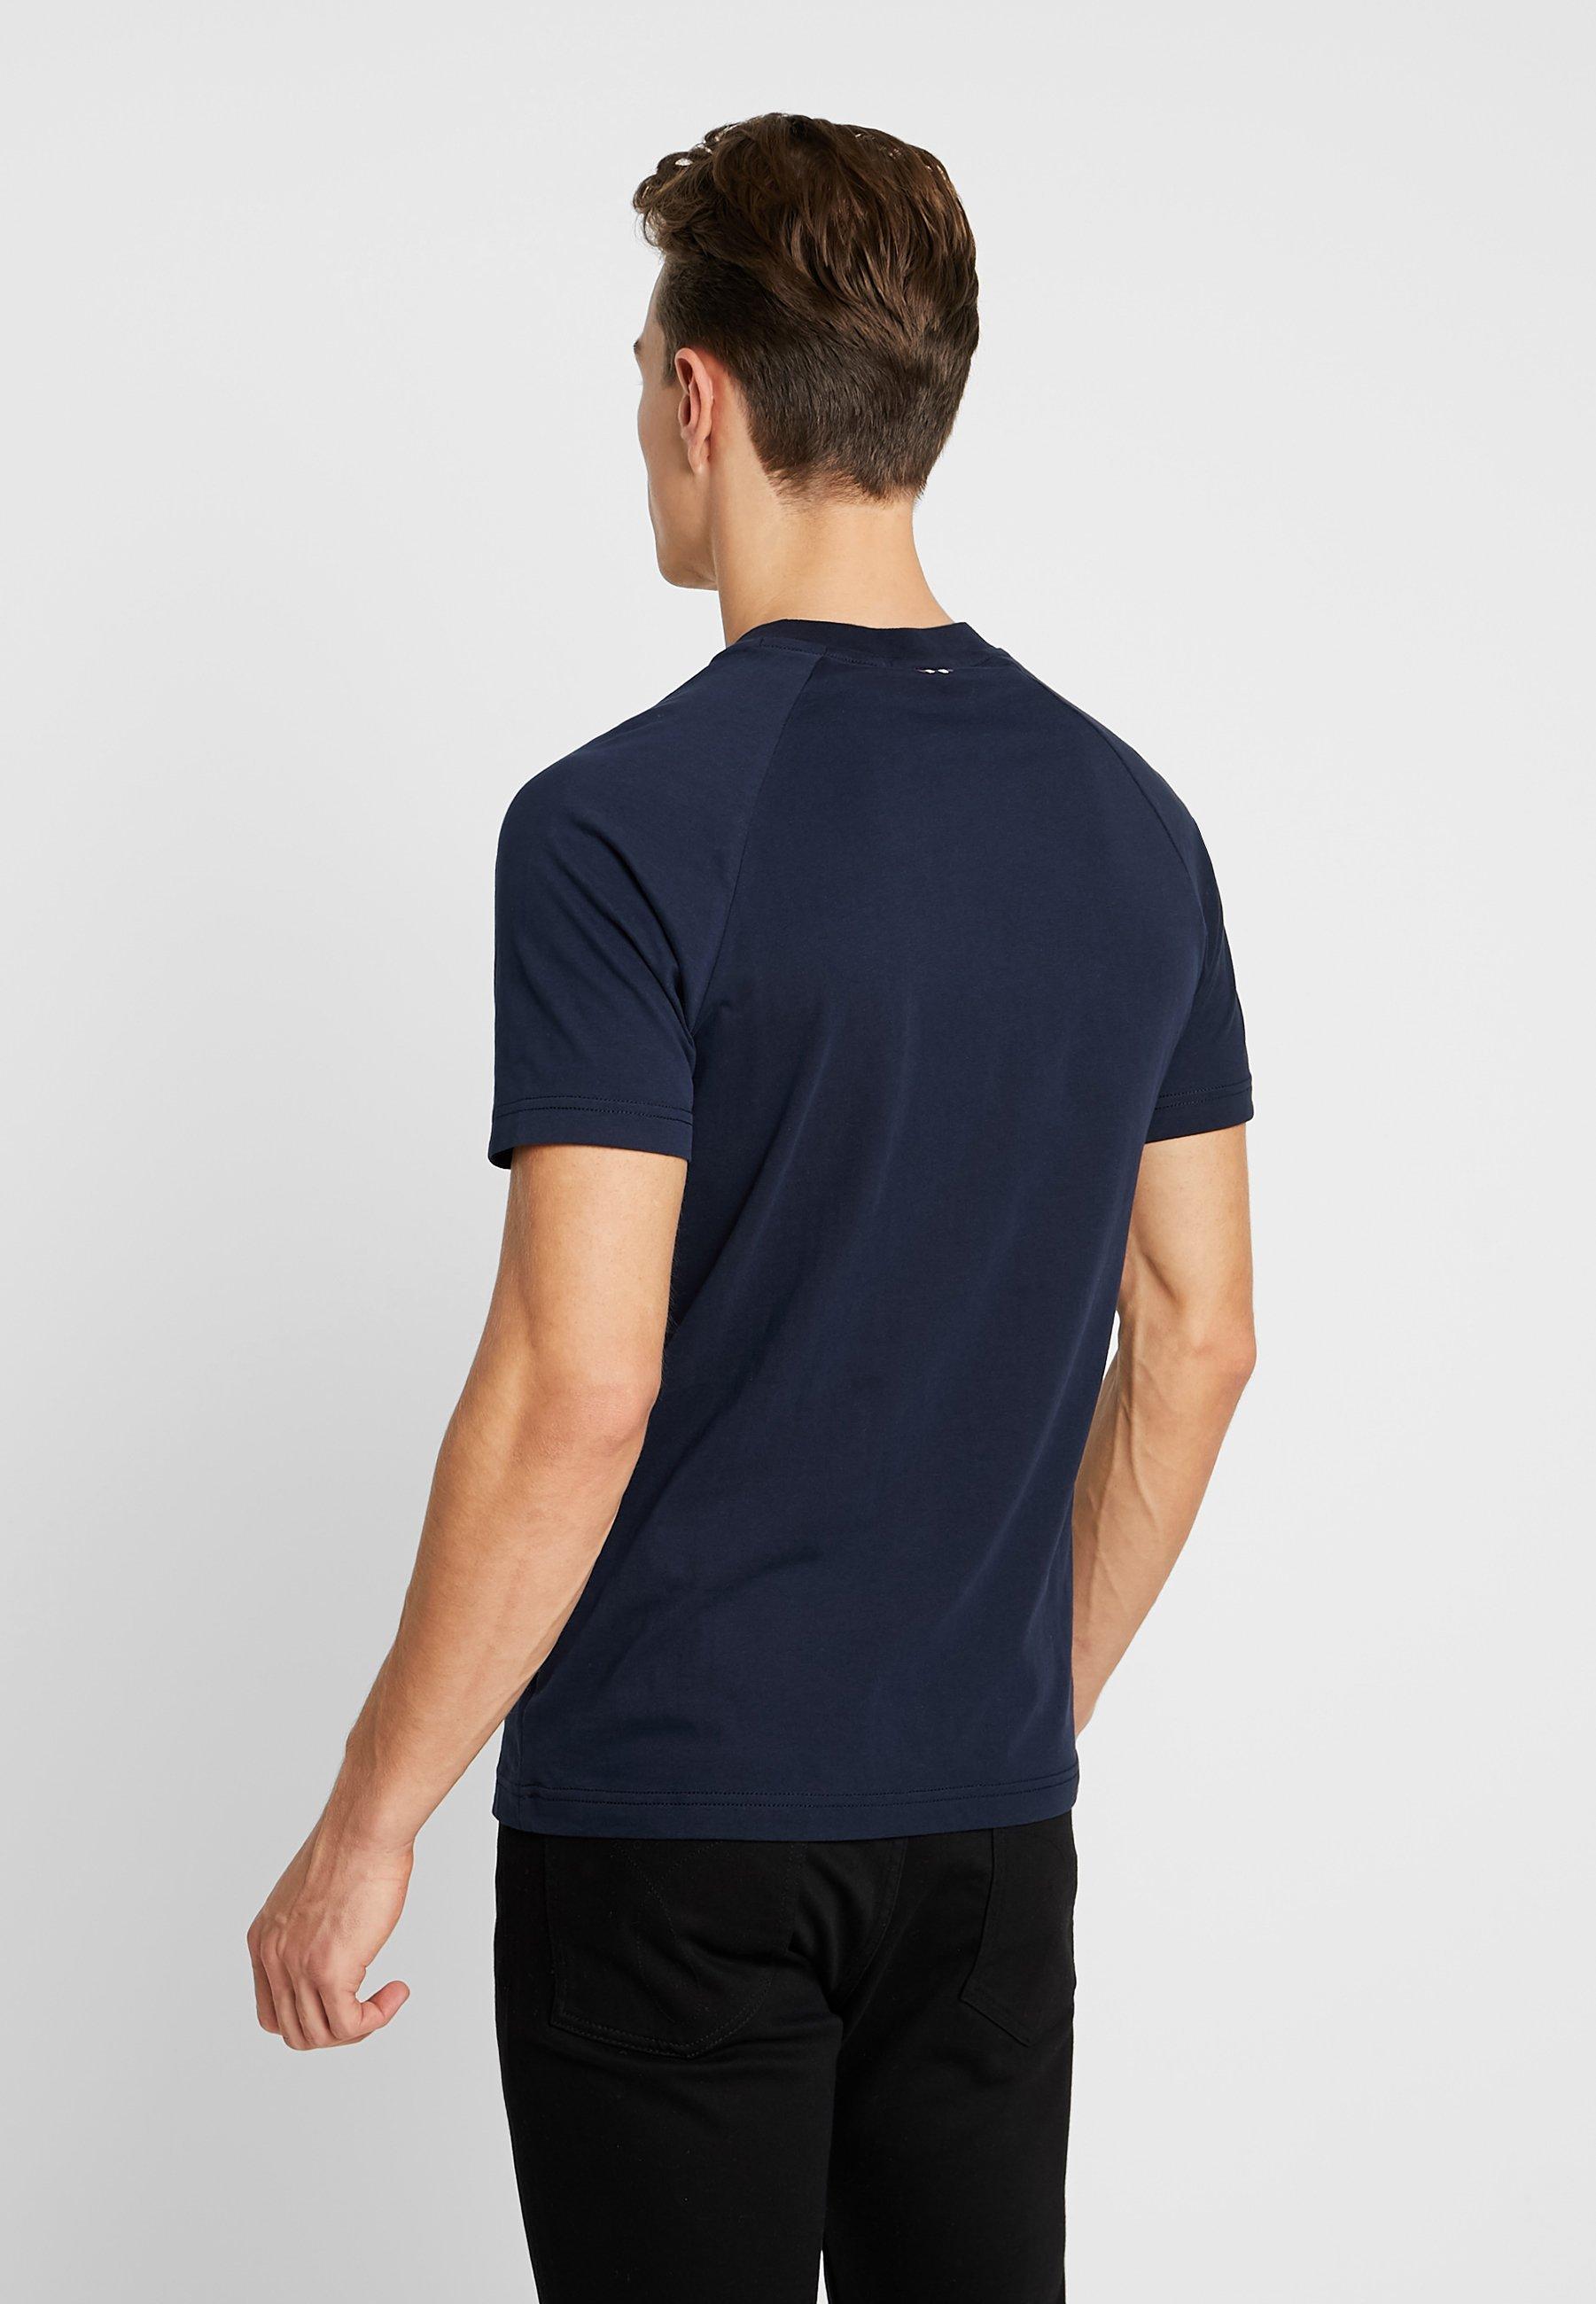 Napapijri SovesT shirt Blu Marine Imprimé c54LqASjR3